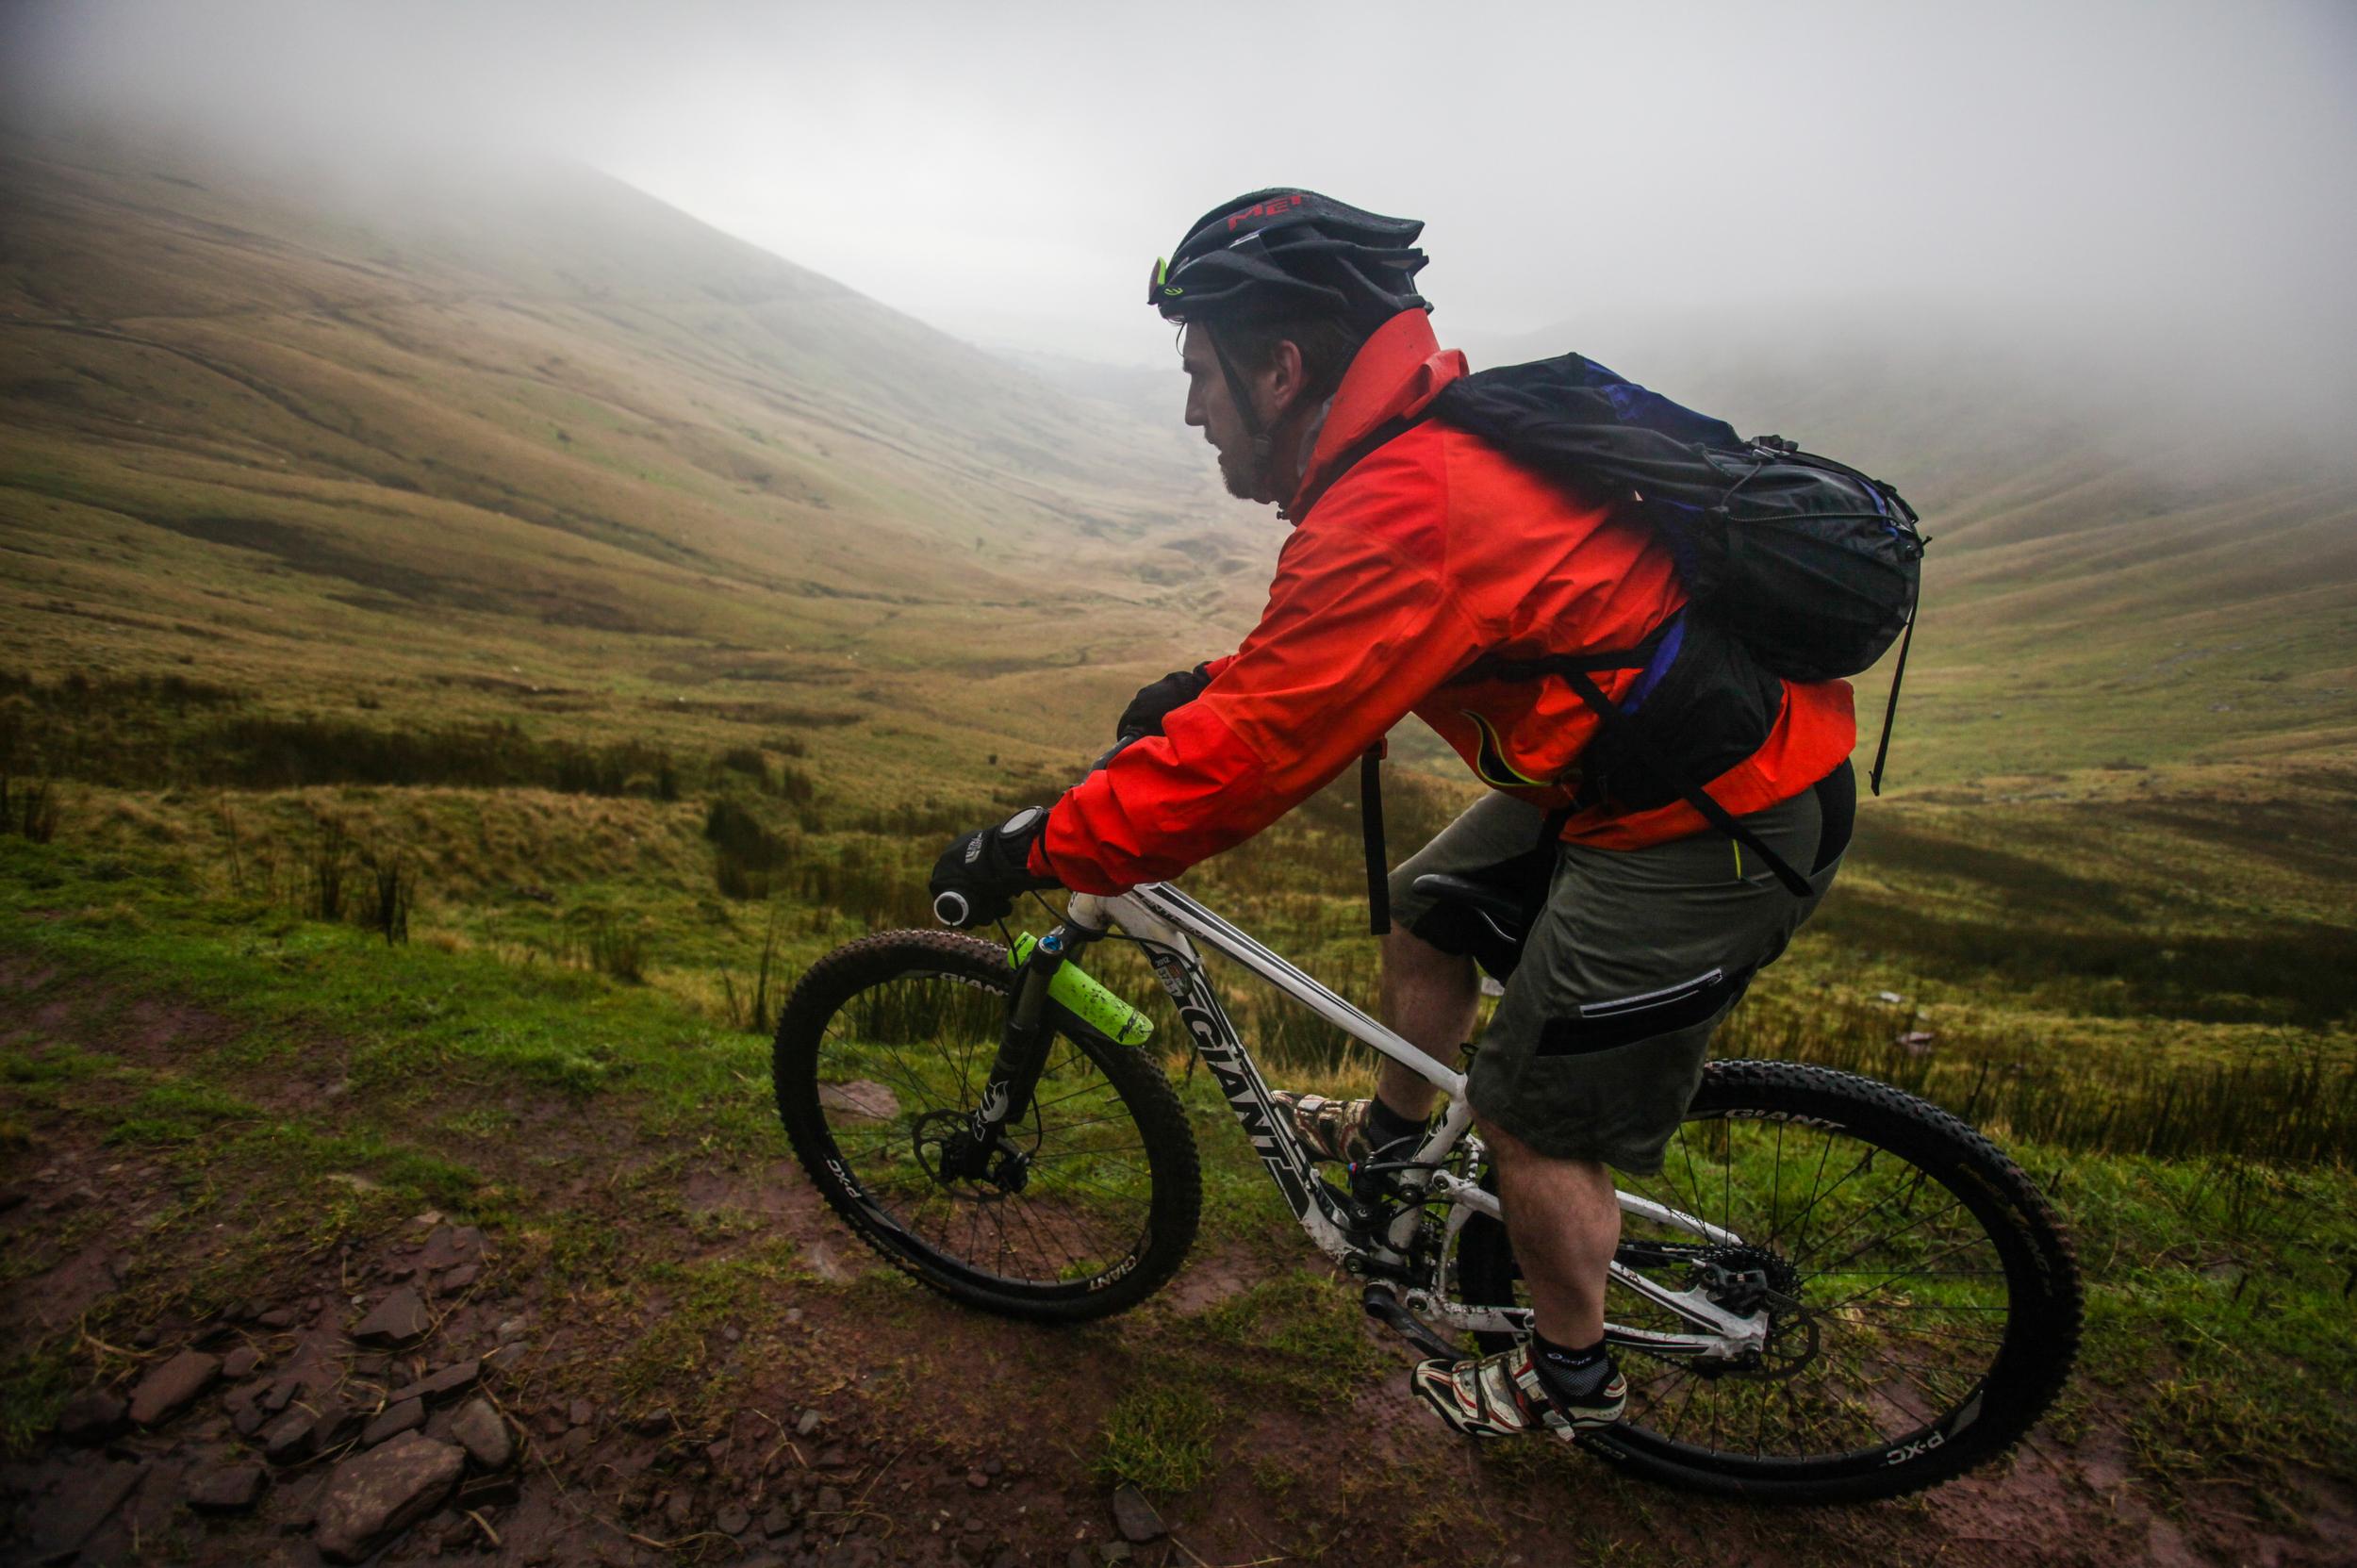 Great British MINI Adventure Day 11 - MTN Biking The Gap in the Brecon Beacons